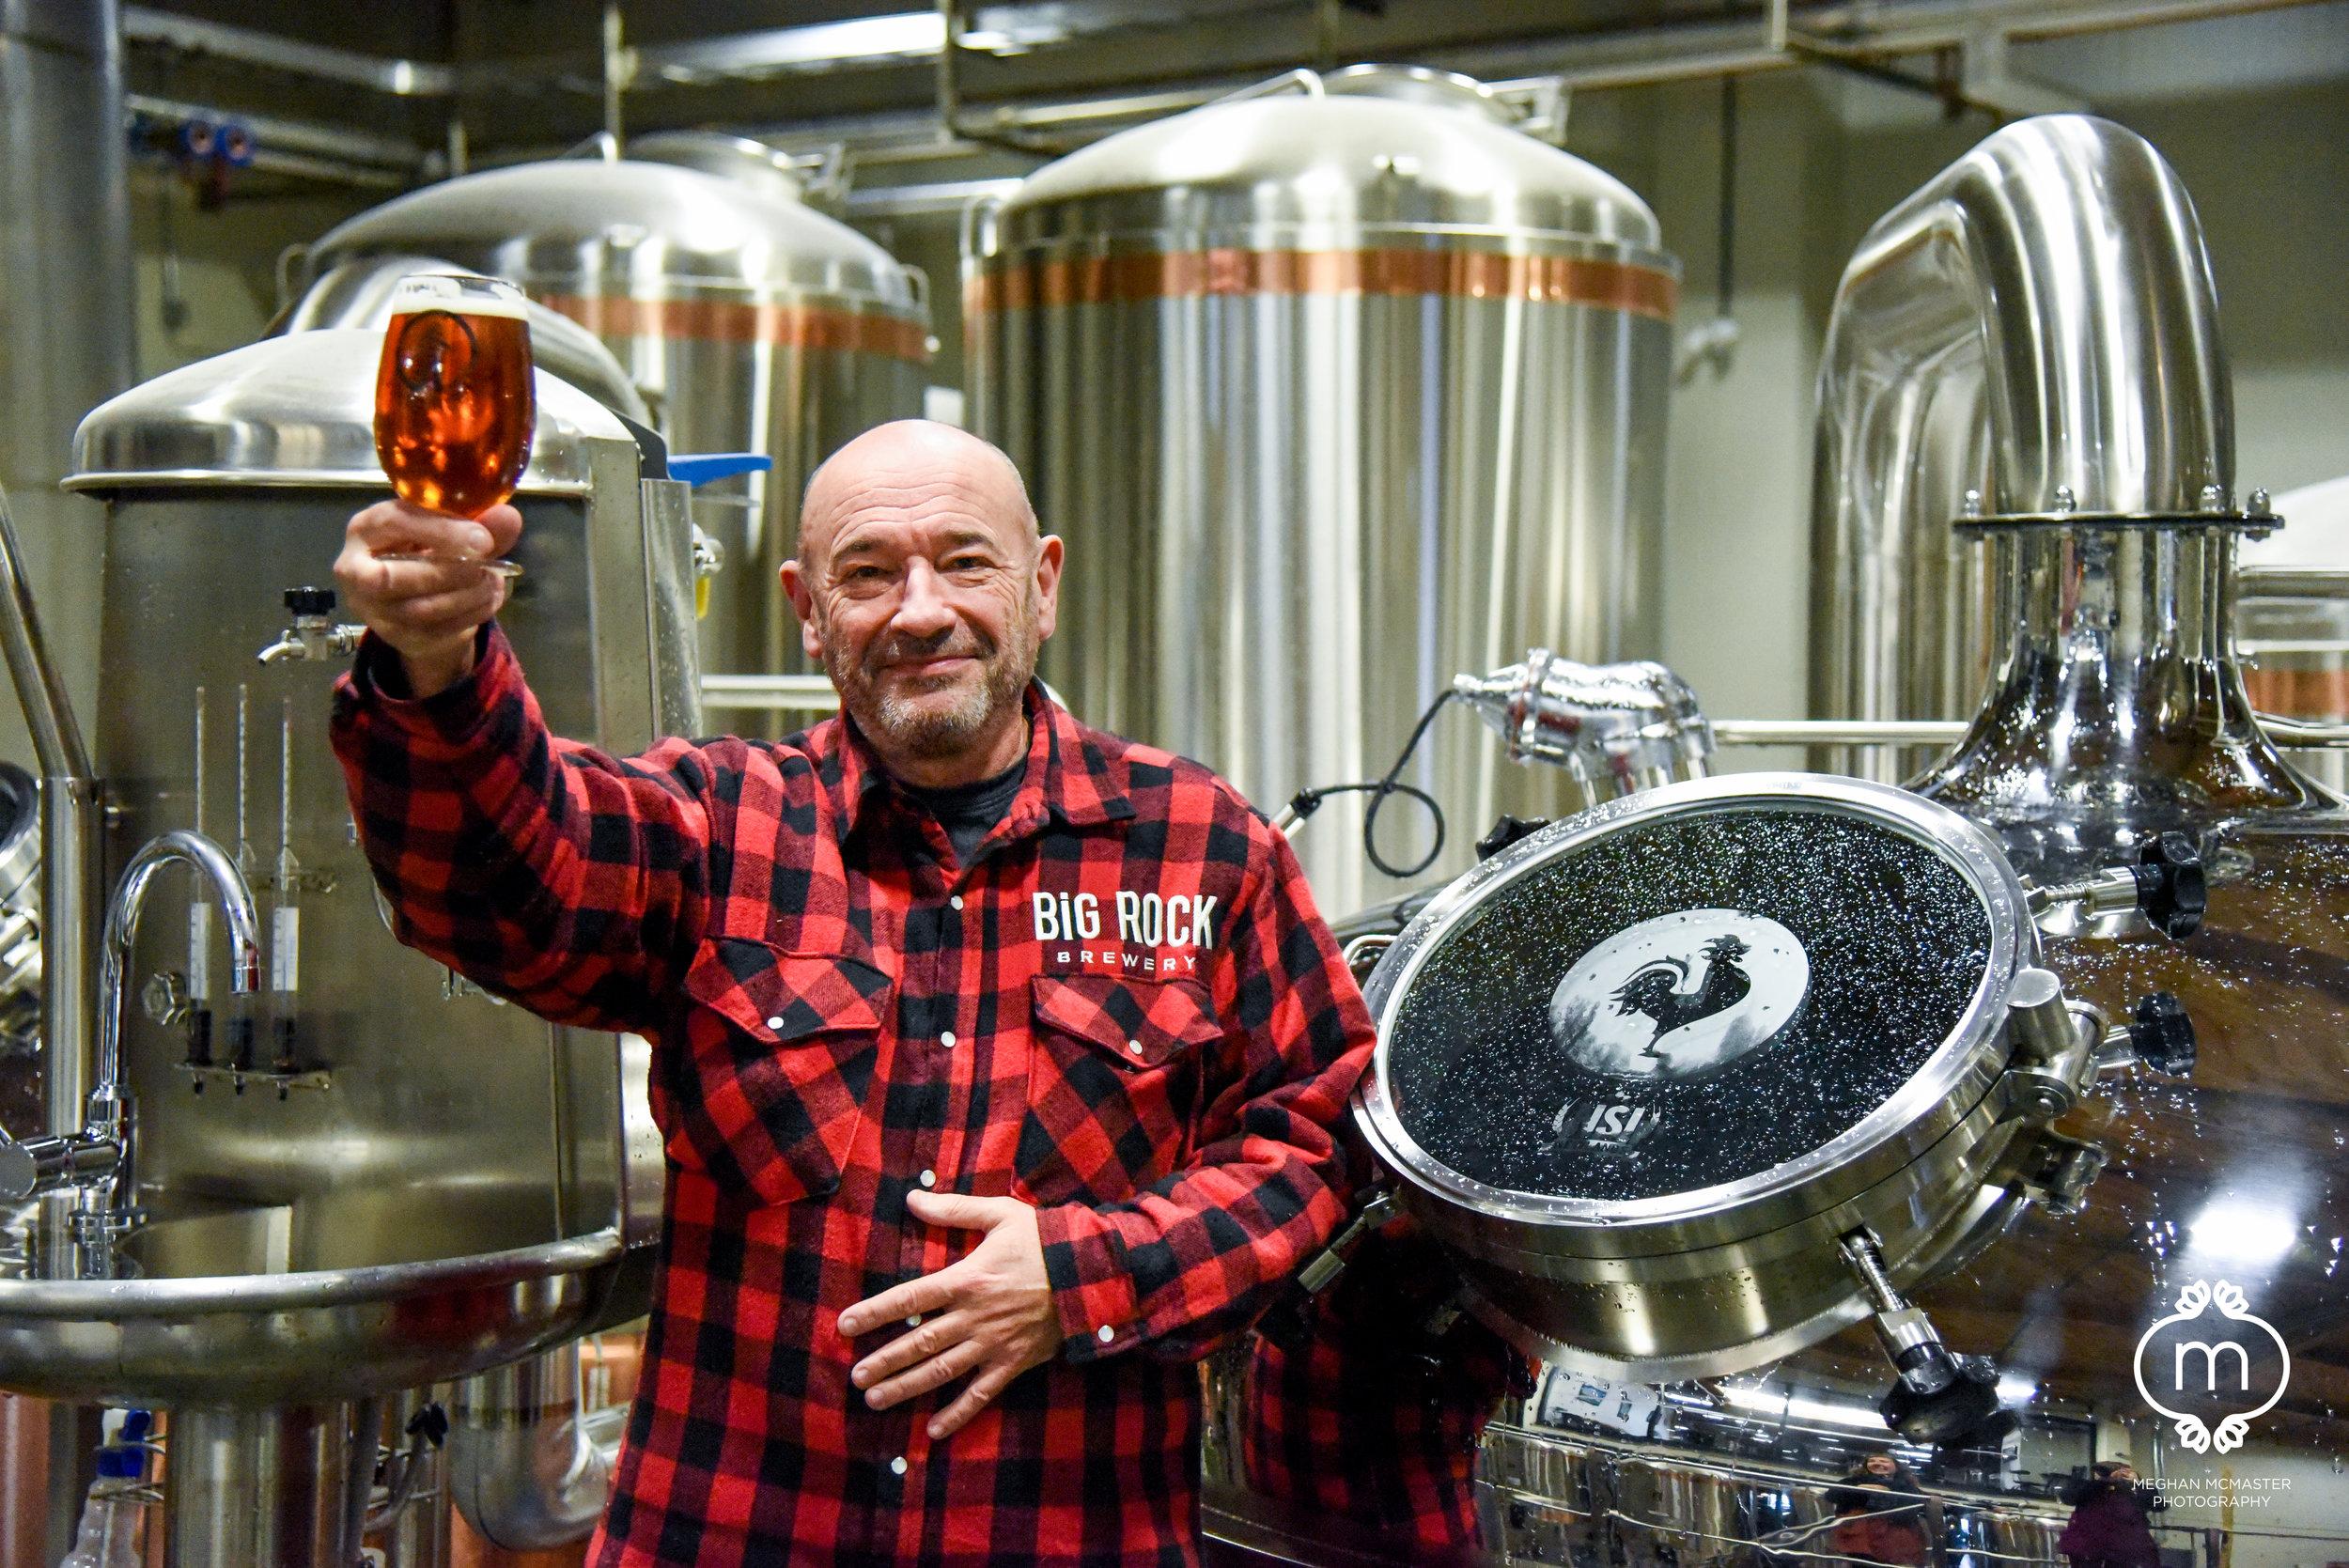 Big Rock Vancouver Brewmaster, Rick Dellow.